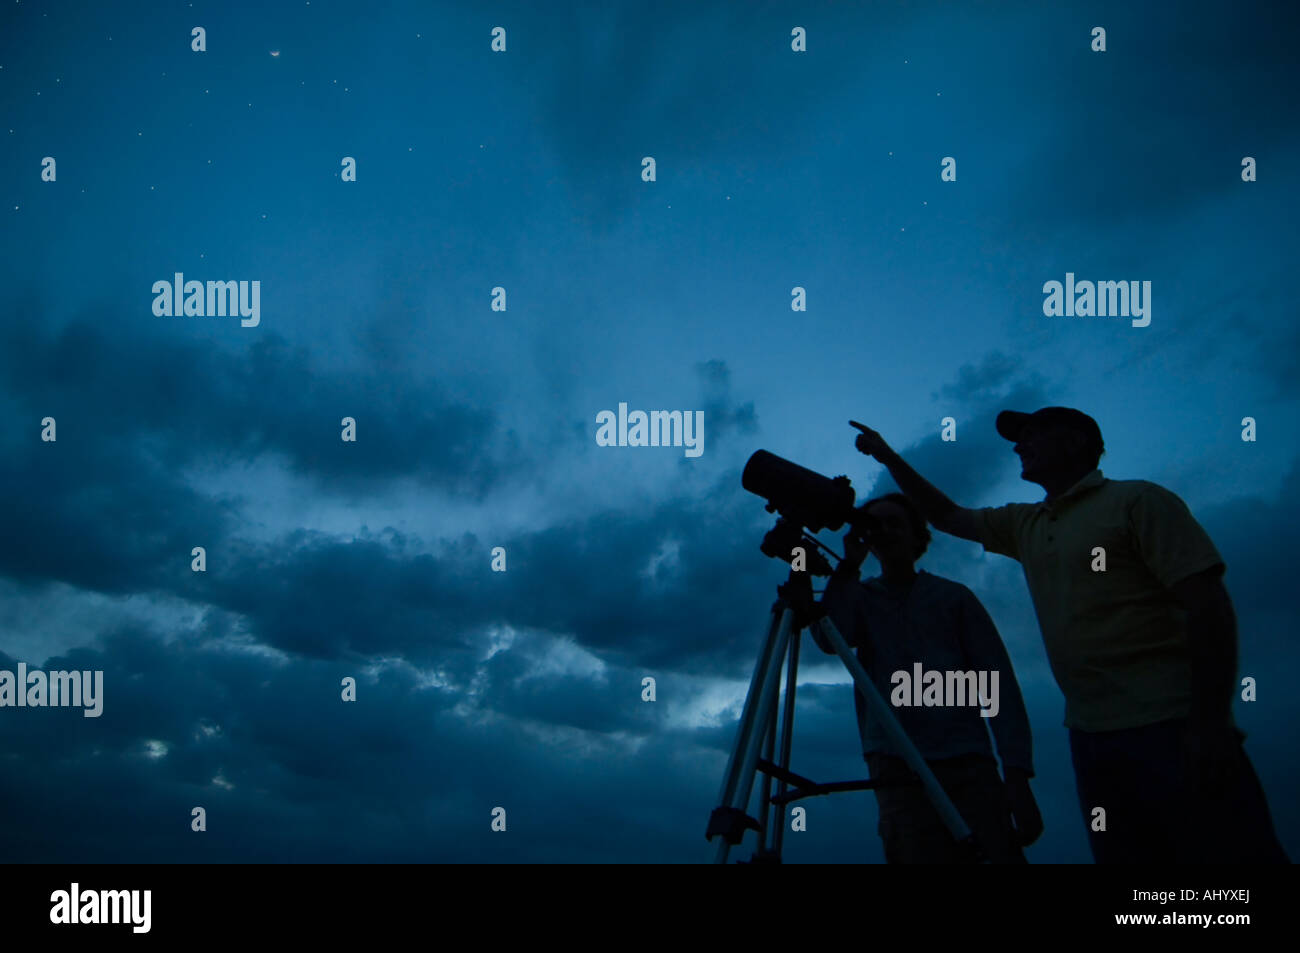 Zoom teleskop iphone g gs foto teleobjektiv linse lens stativ